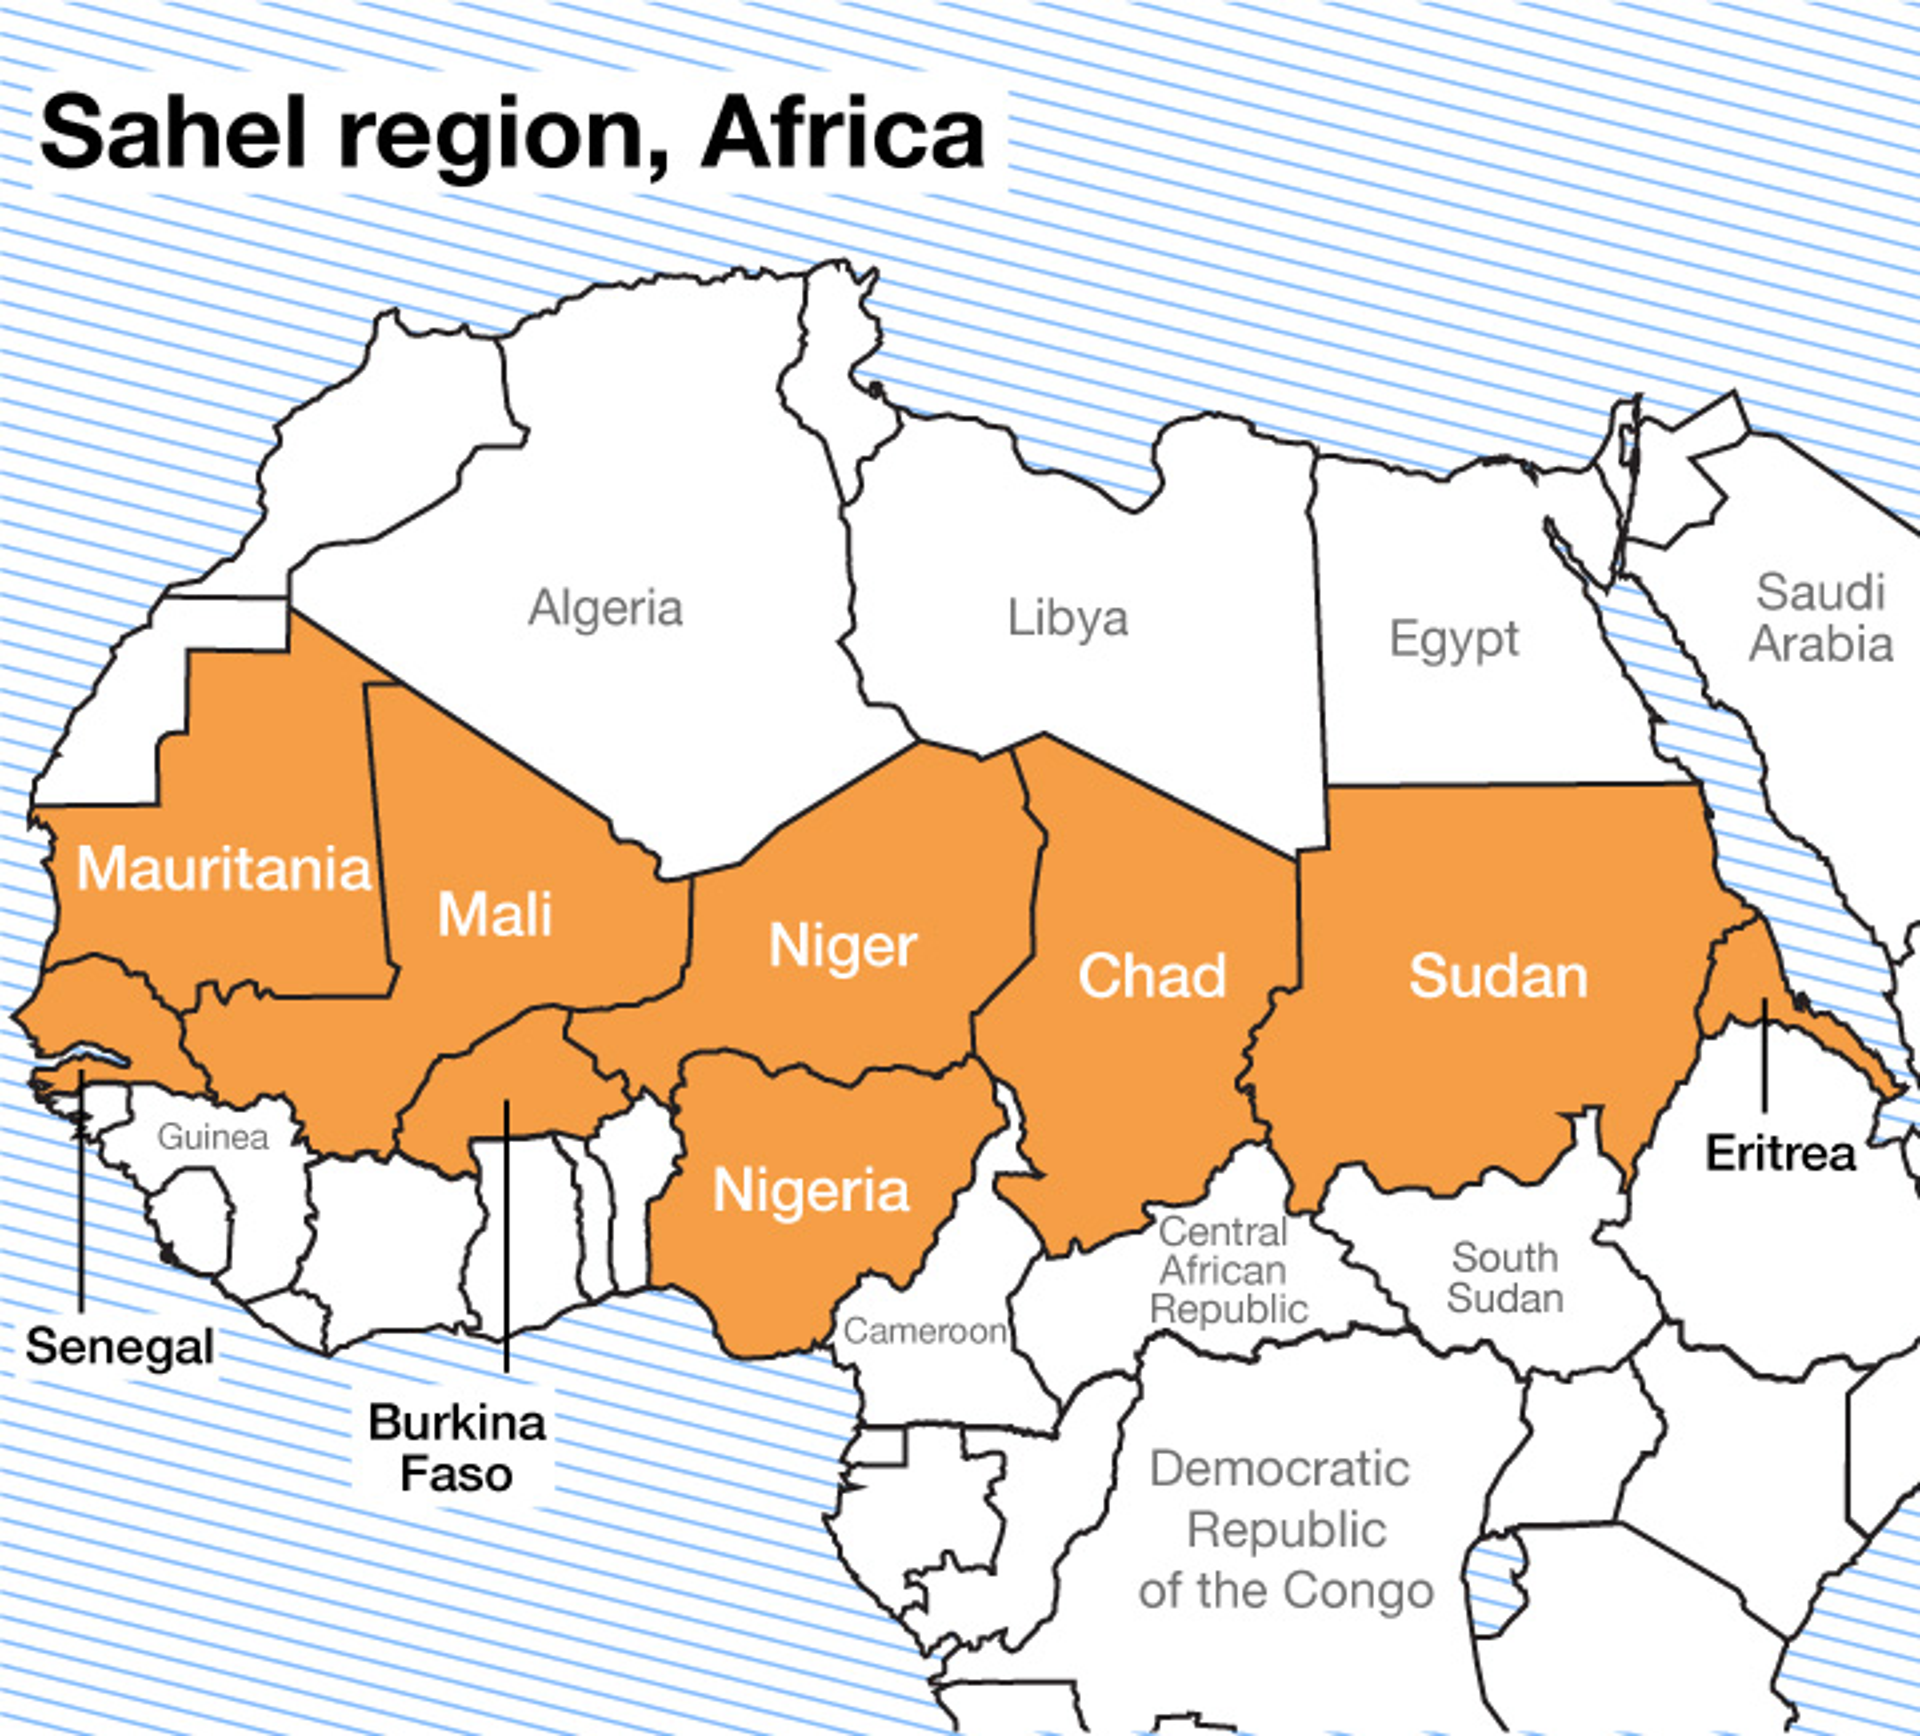 Sahel region Africa